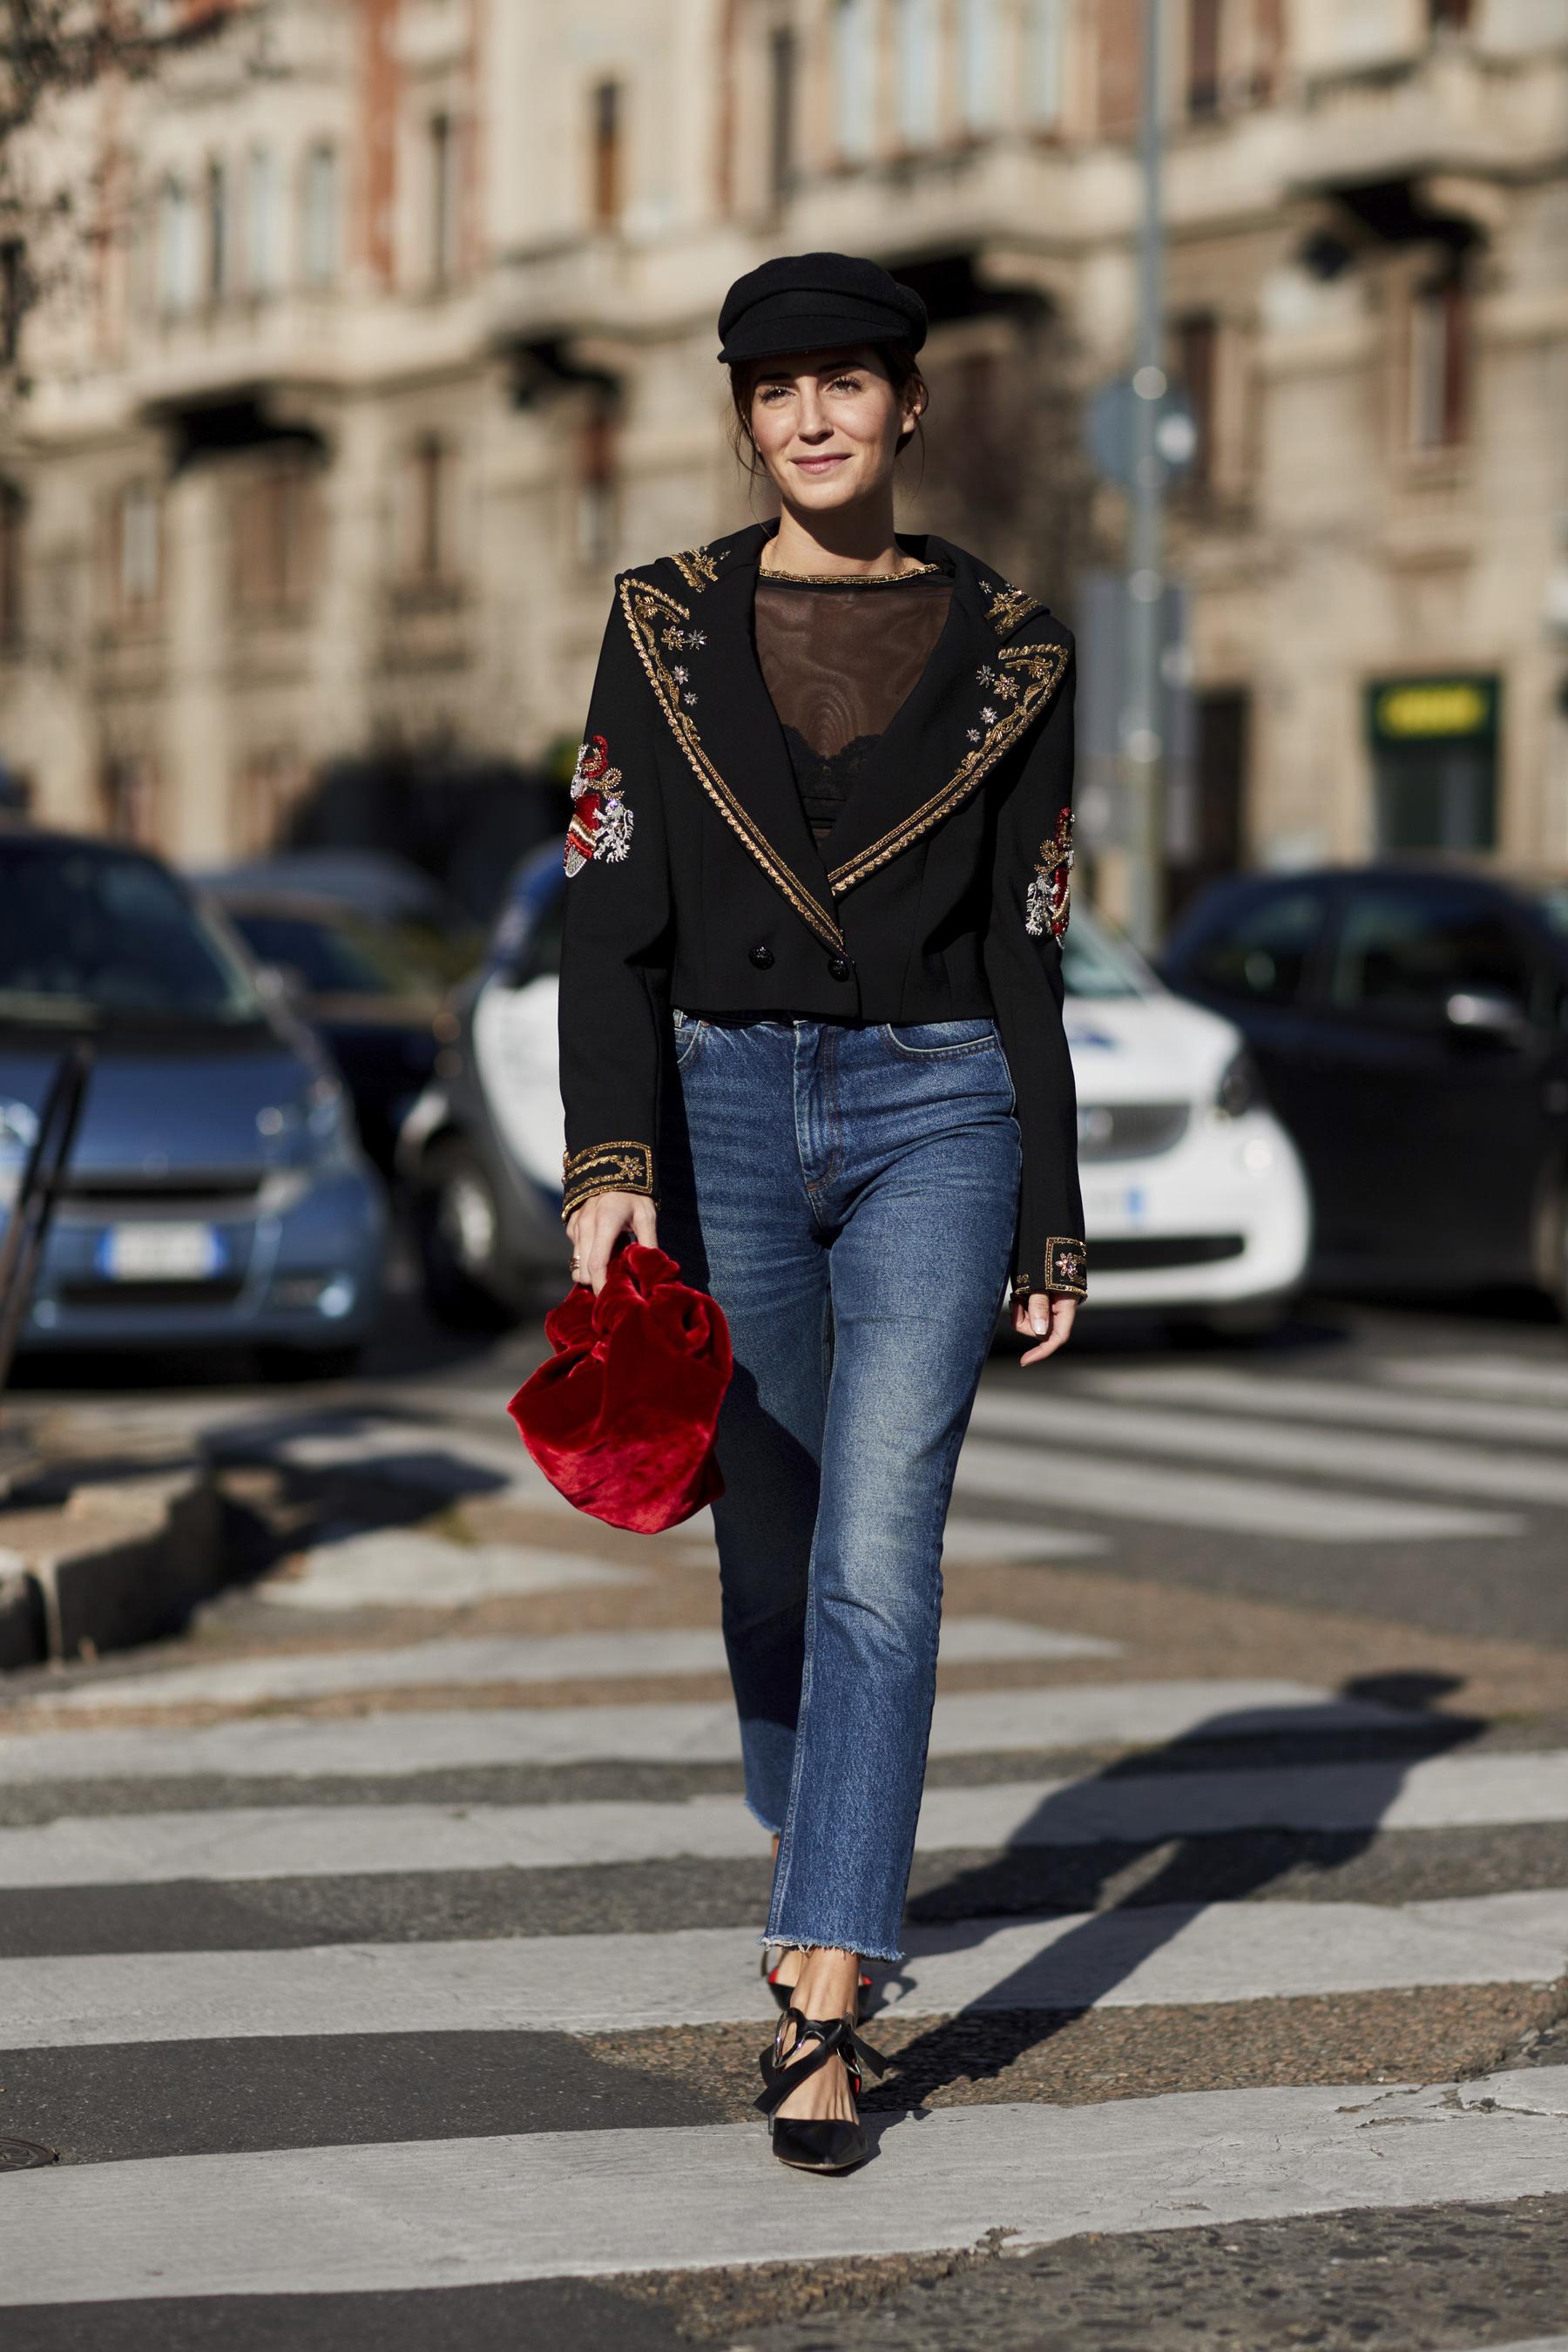 Milan Fashion Week Street Style Spring 2018 Day 1 Cont.